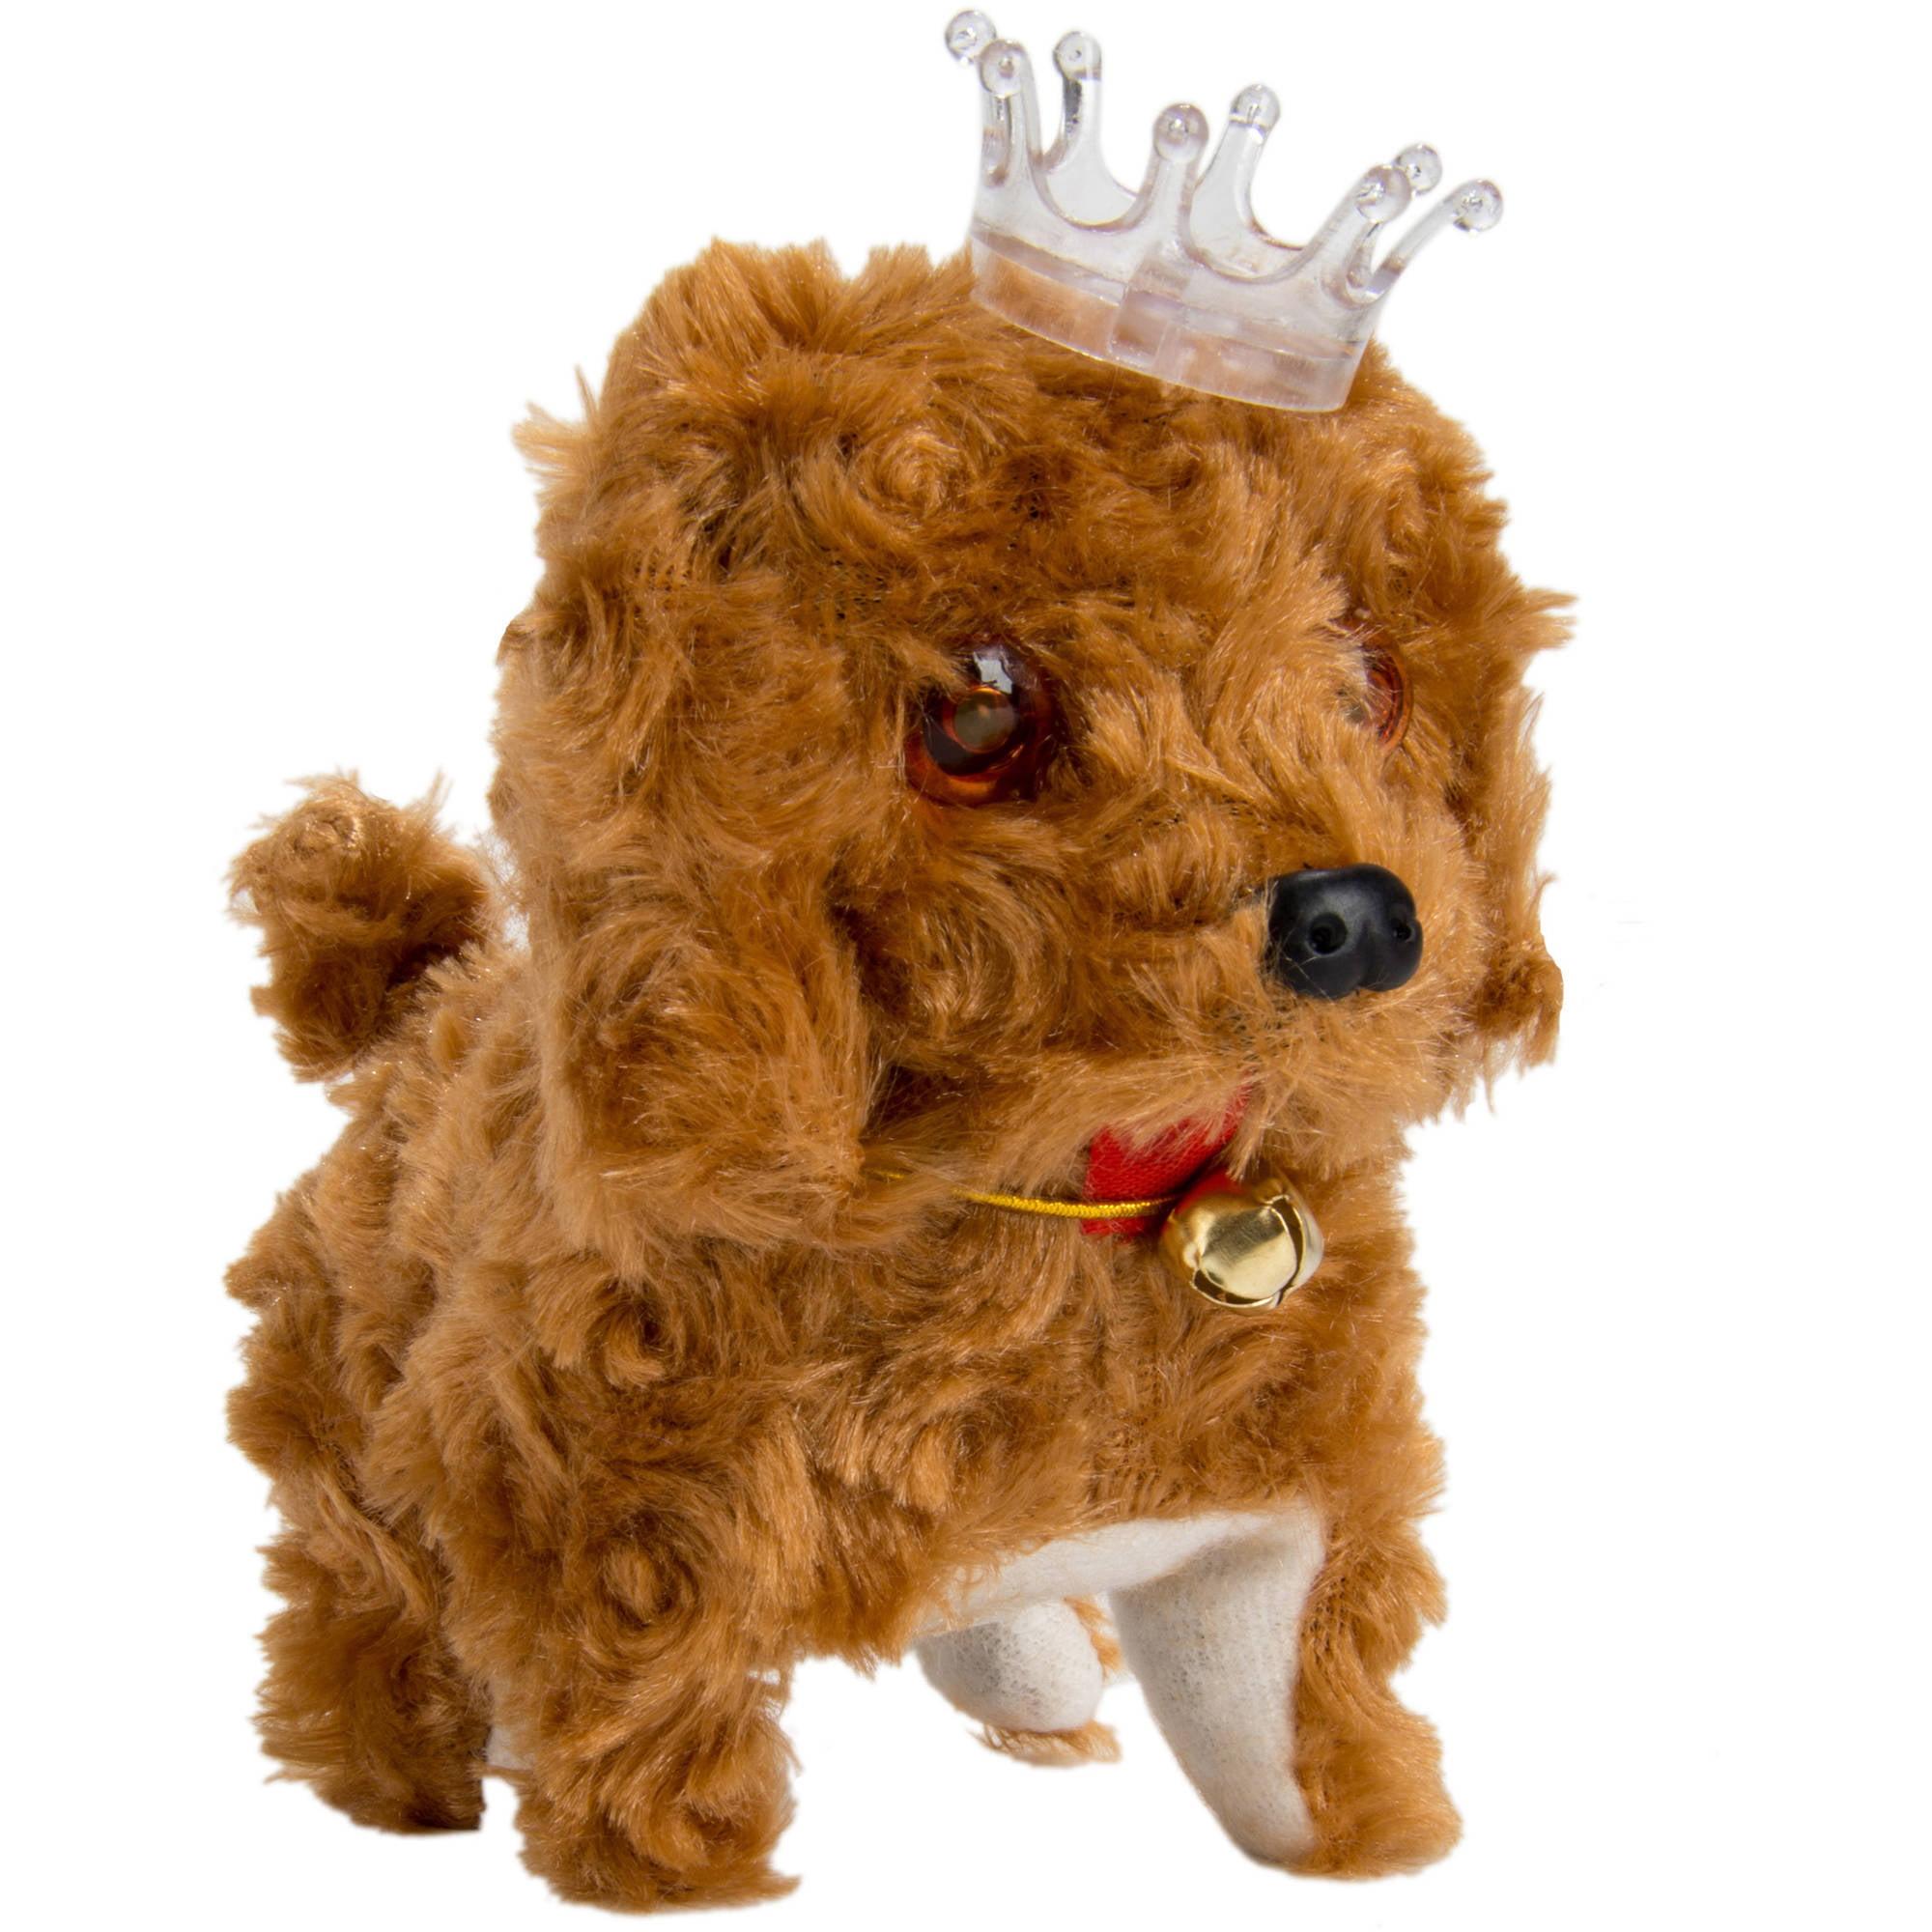 BLUE BLOCK BLUEBLOCK Classic Design Electronic Walking and Barking Puppy Plush Toy